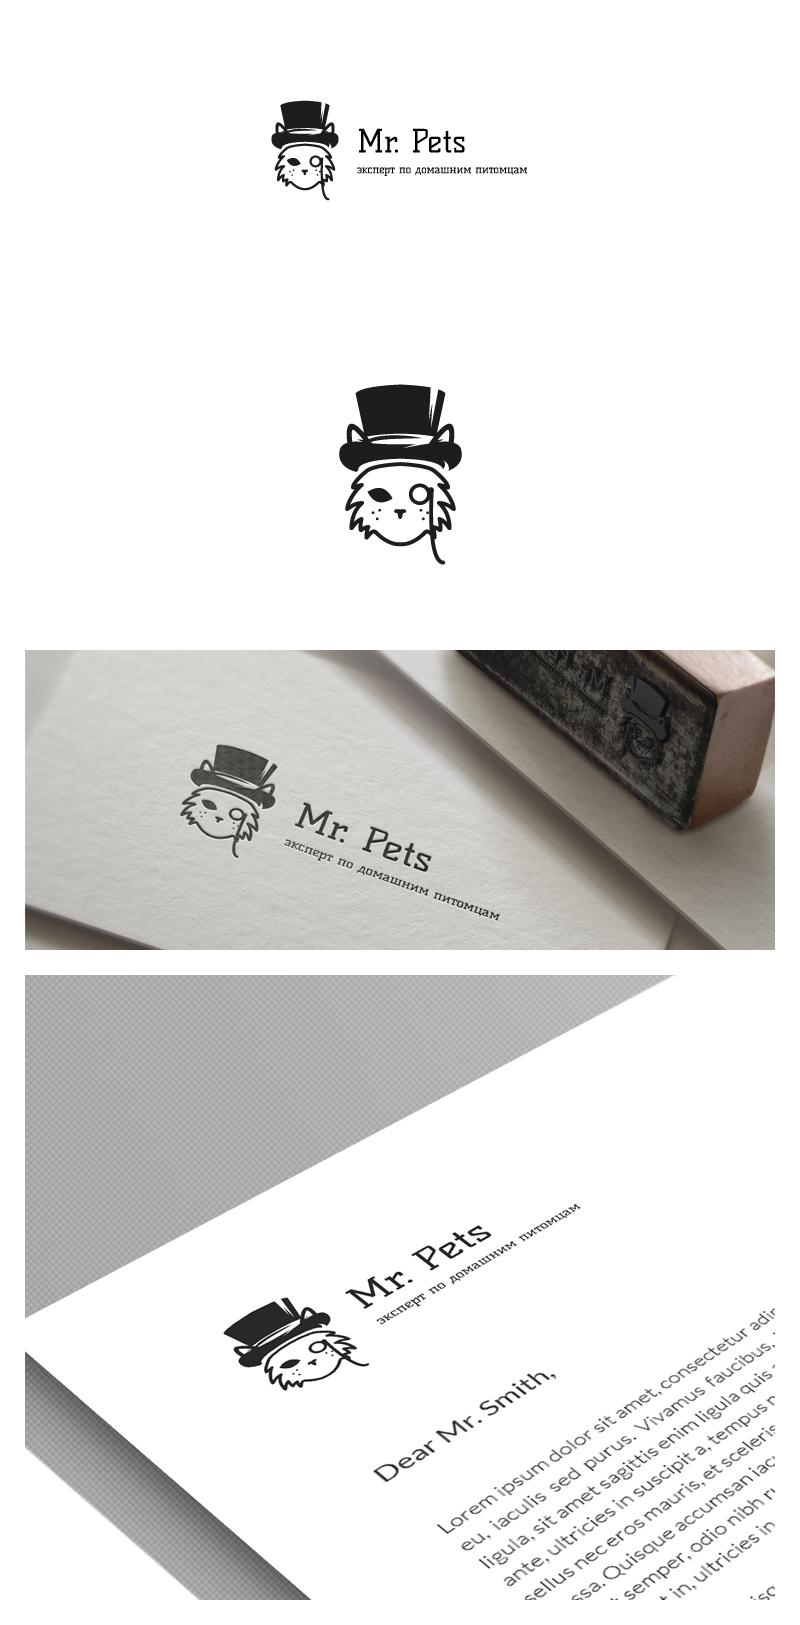 Mr. Pets